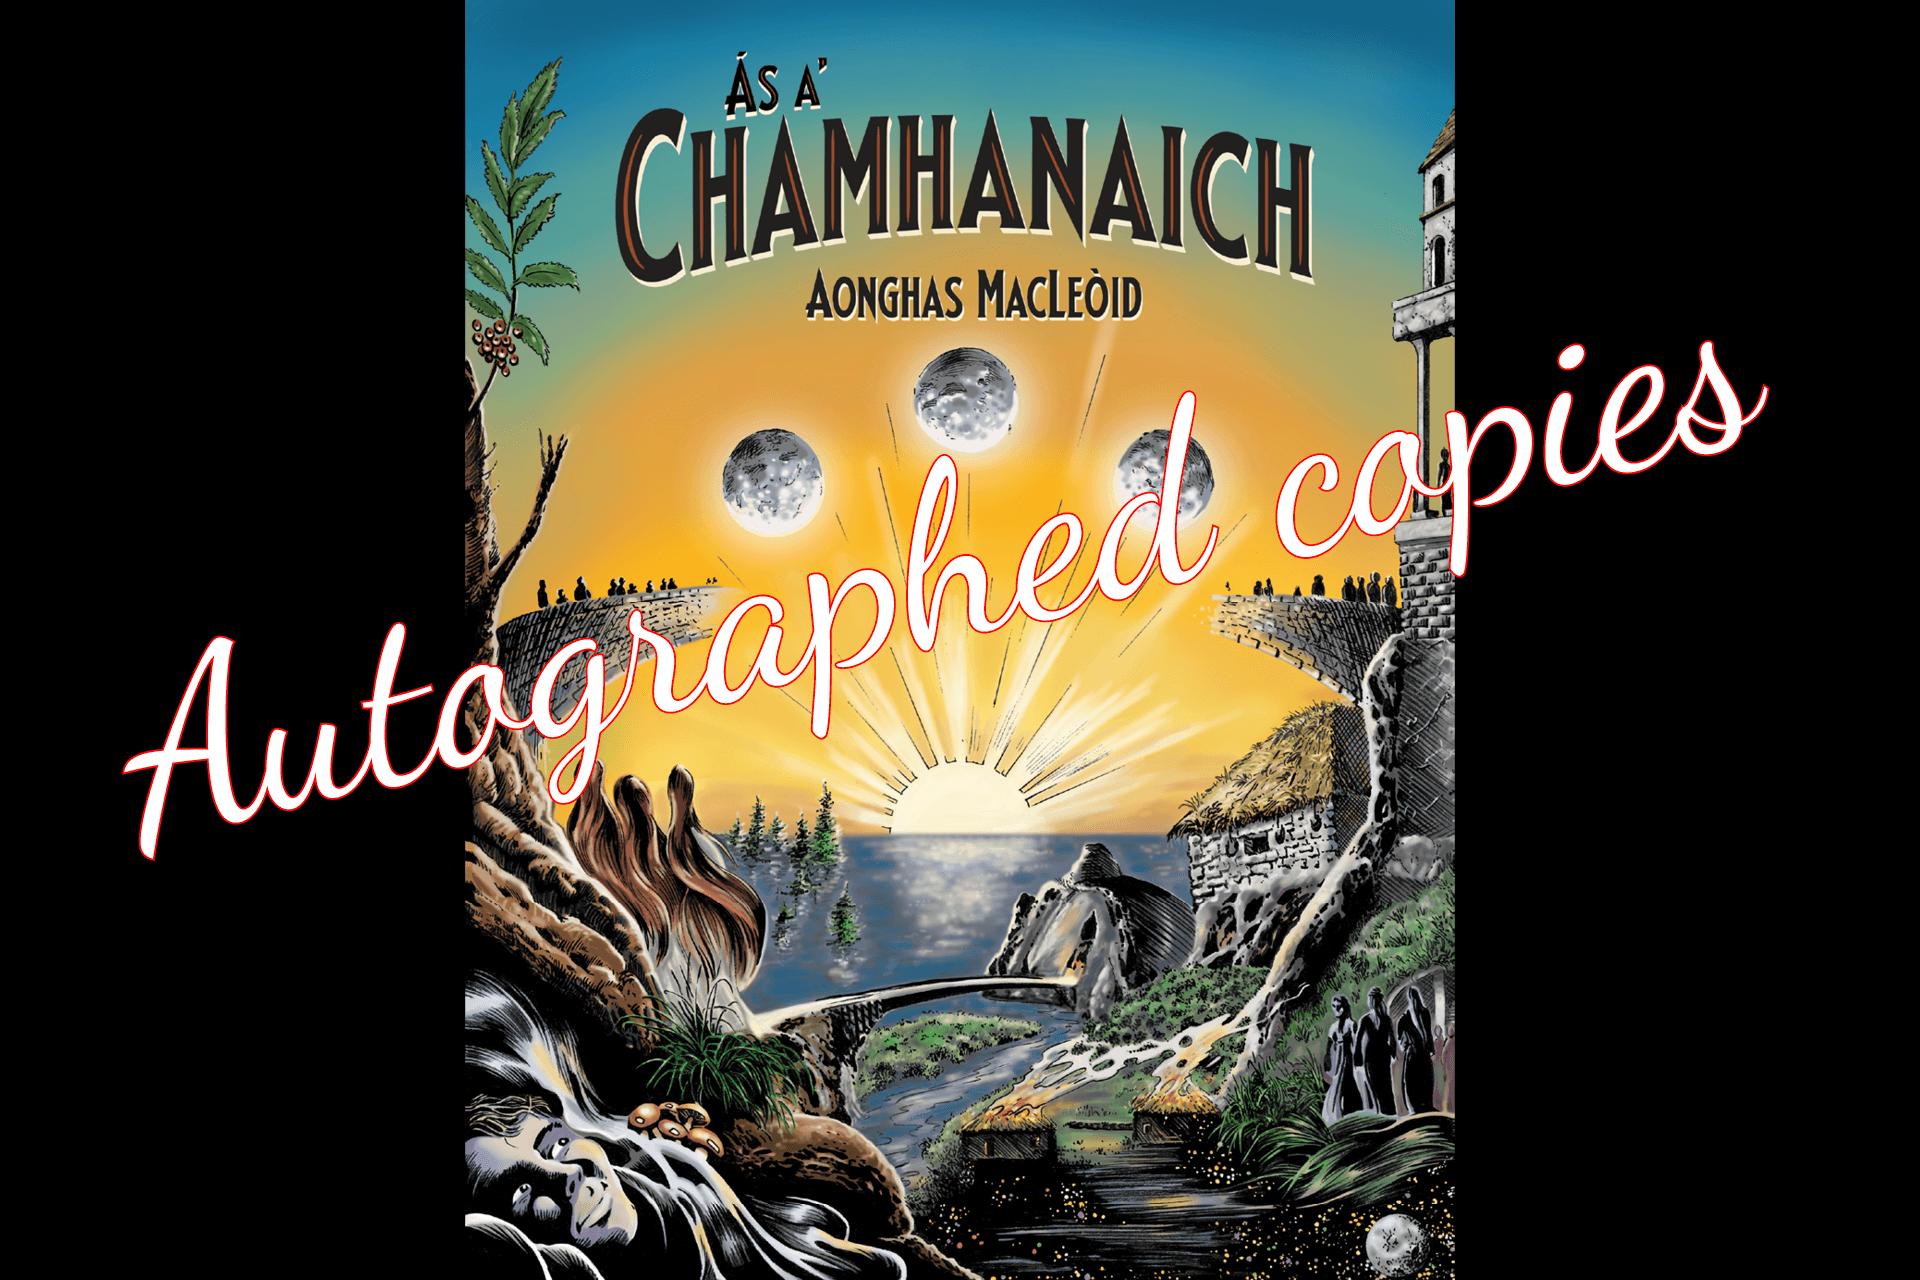 Autographed copies of Ás a' Chamhanaich